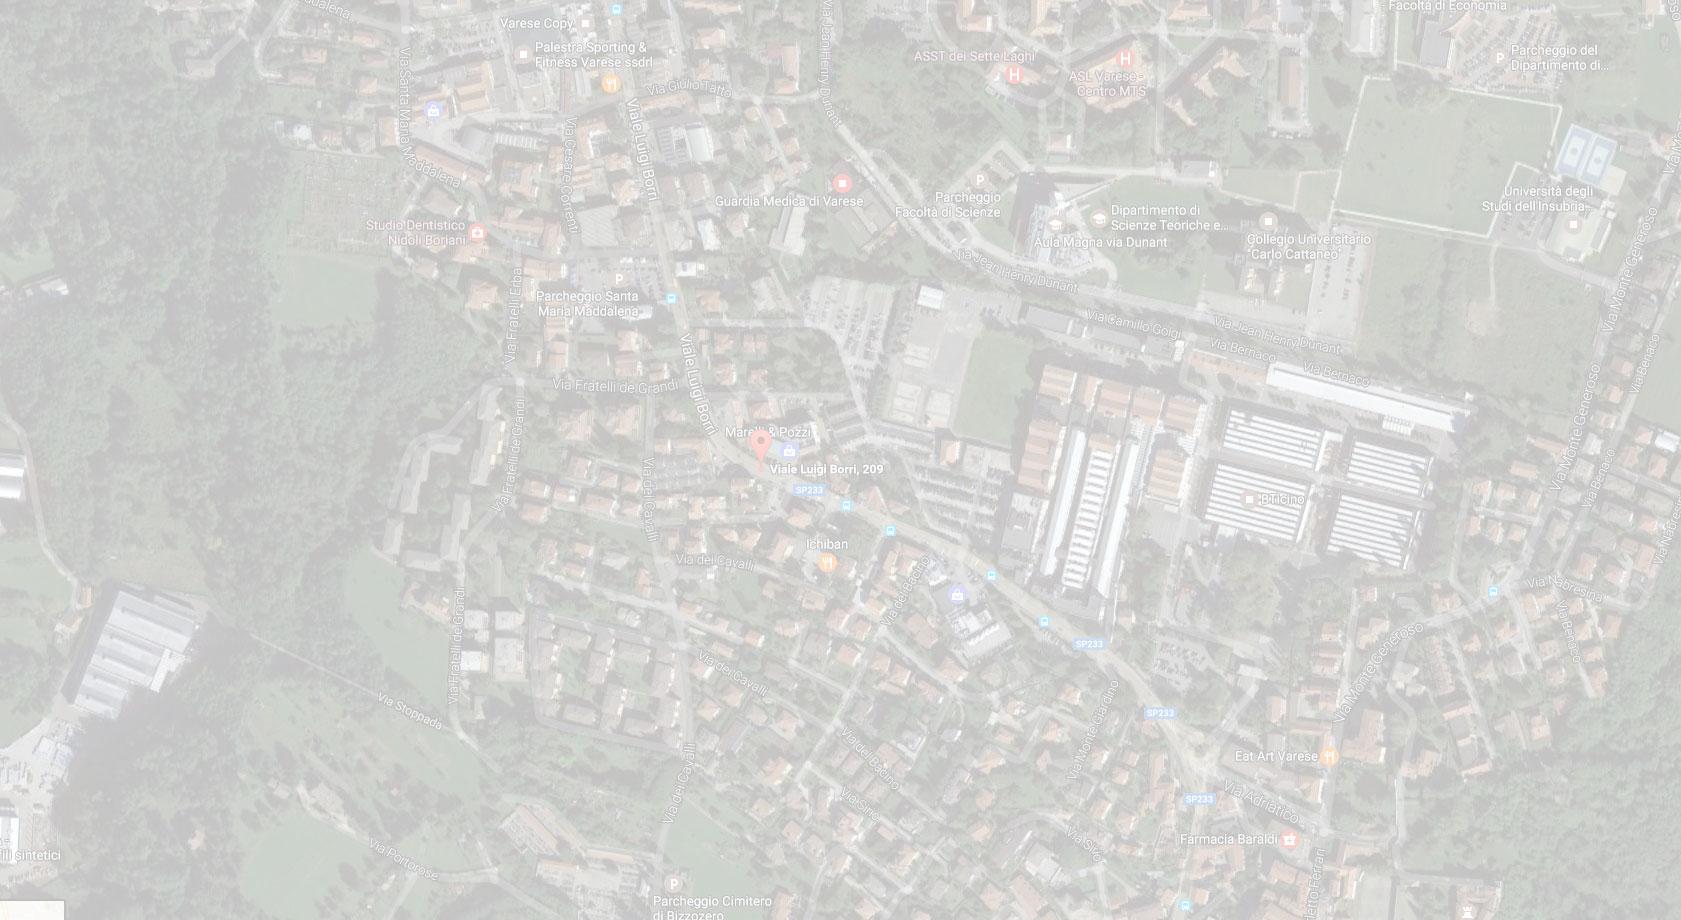 NUOVA SEDE COLLEGIO IPASVI VARESE - OPI Varese